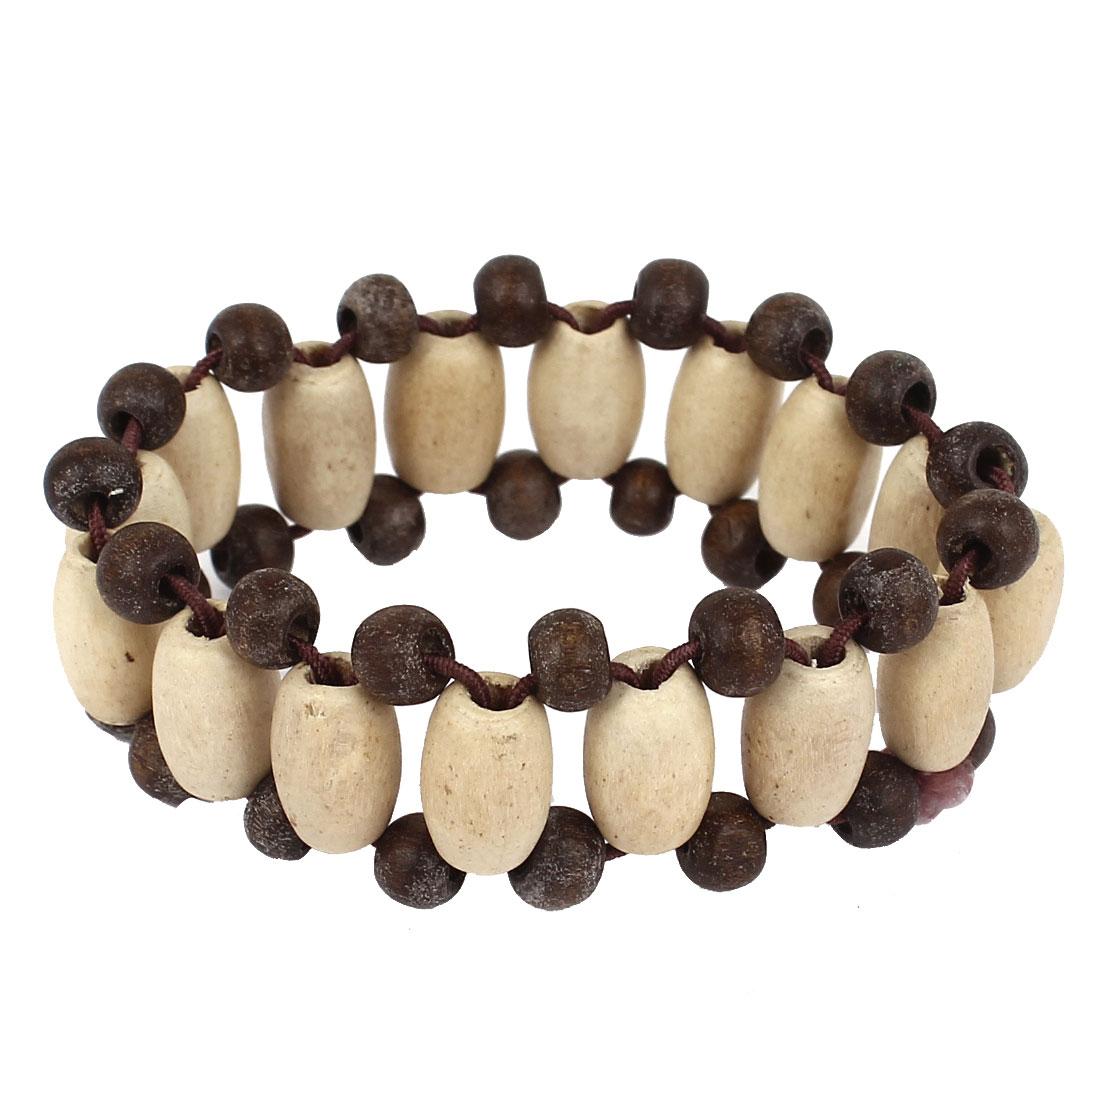 Woman Wooden Beads Ornament Elastic Wrist Chain Bracelet Bangle Beige Gray